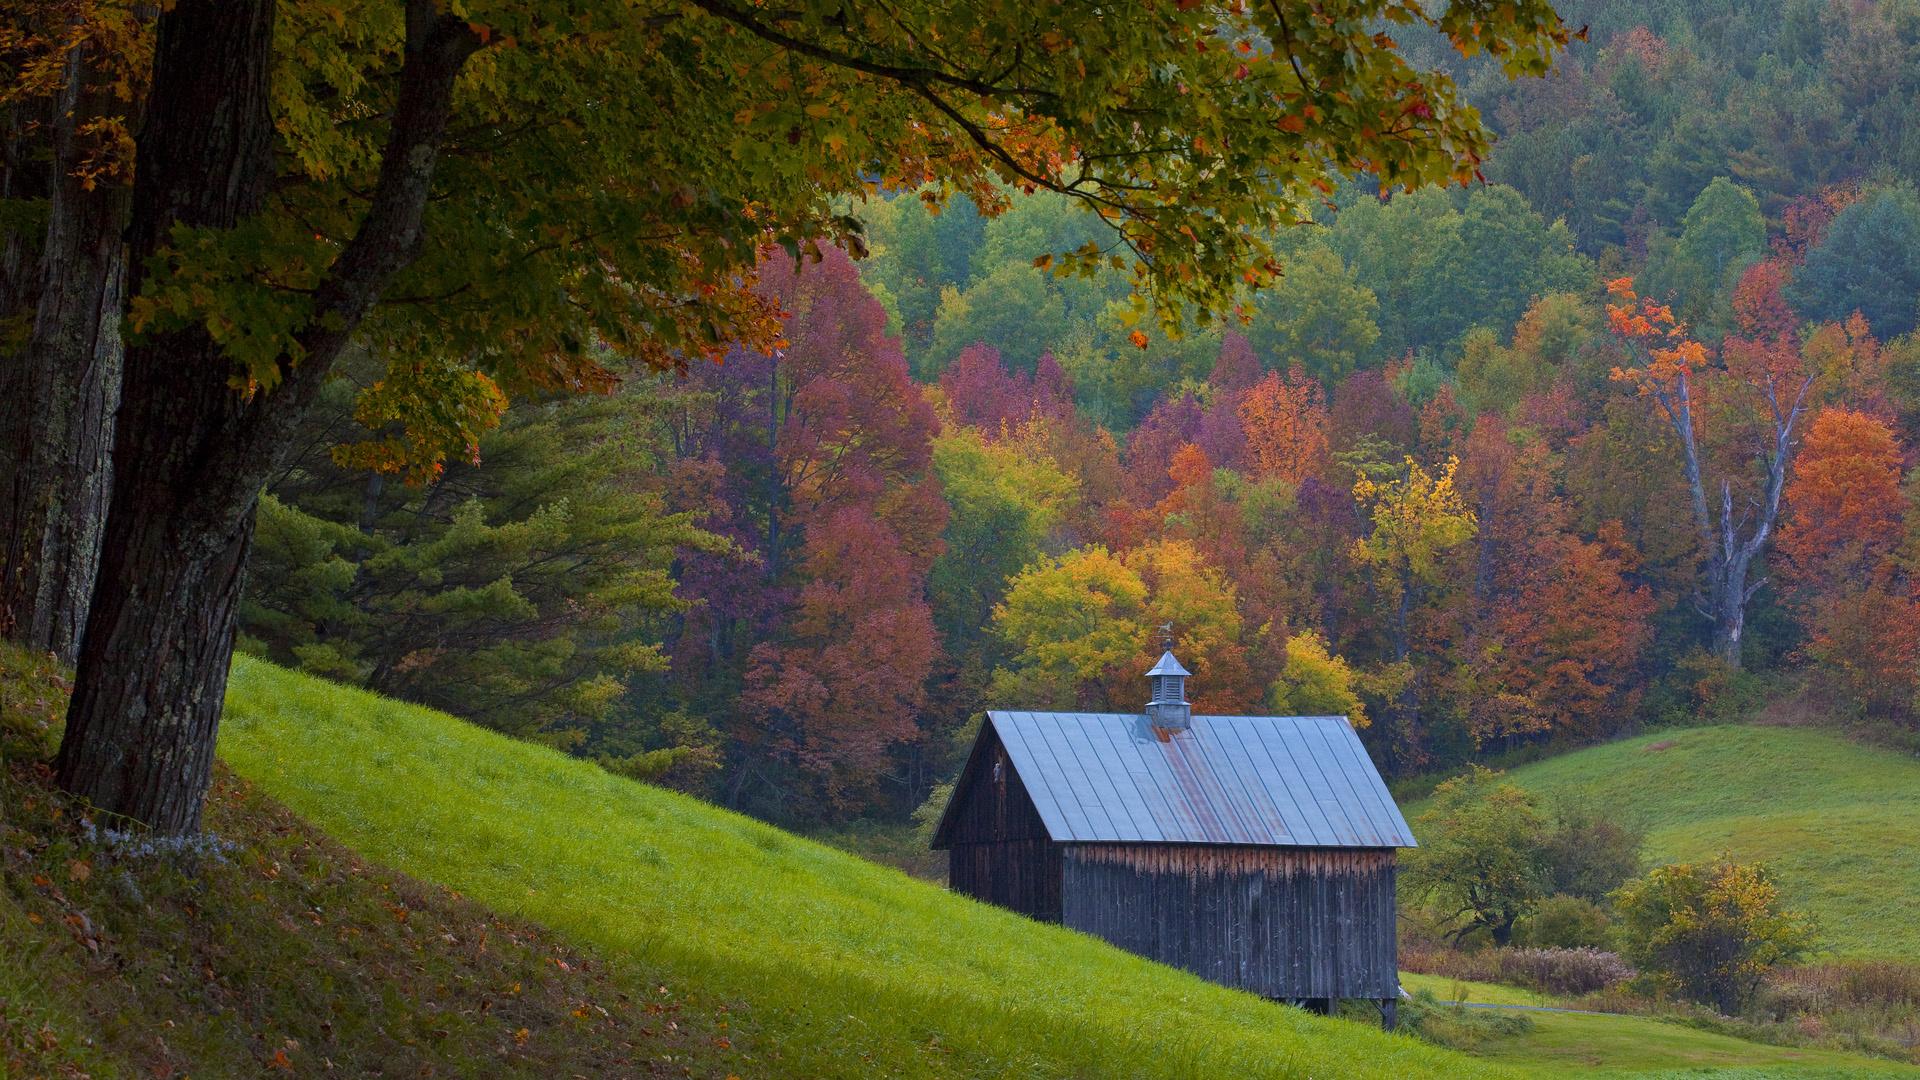 vermont in autumn hd wallpaper - photo #6